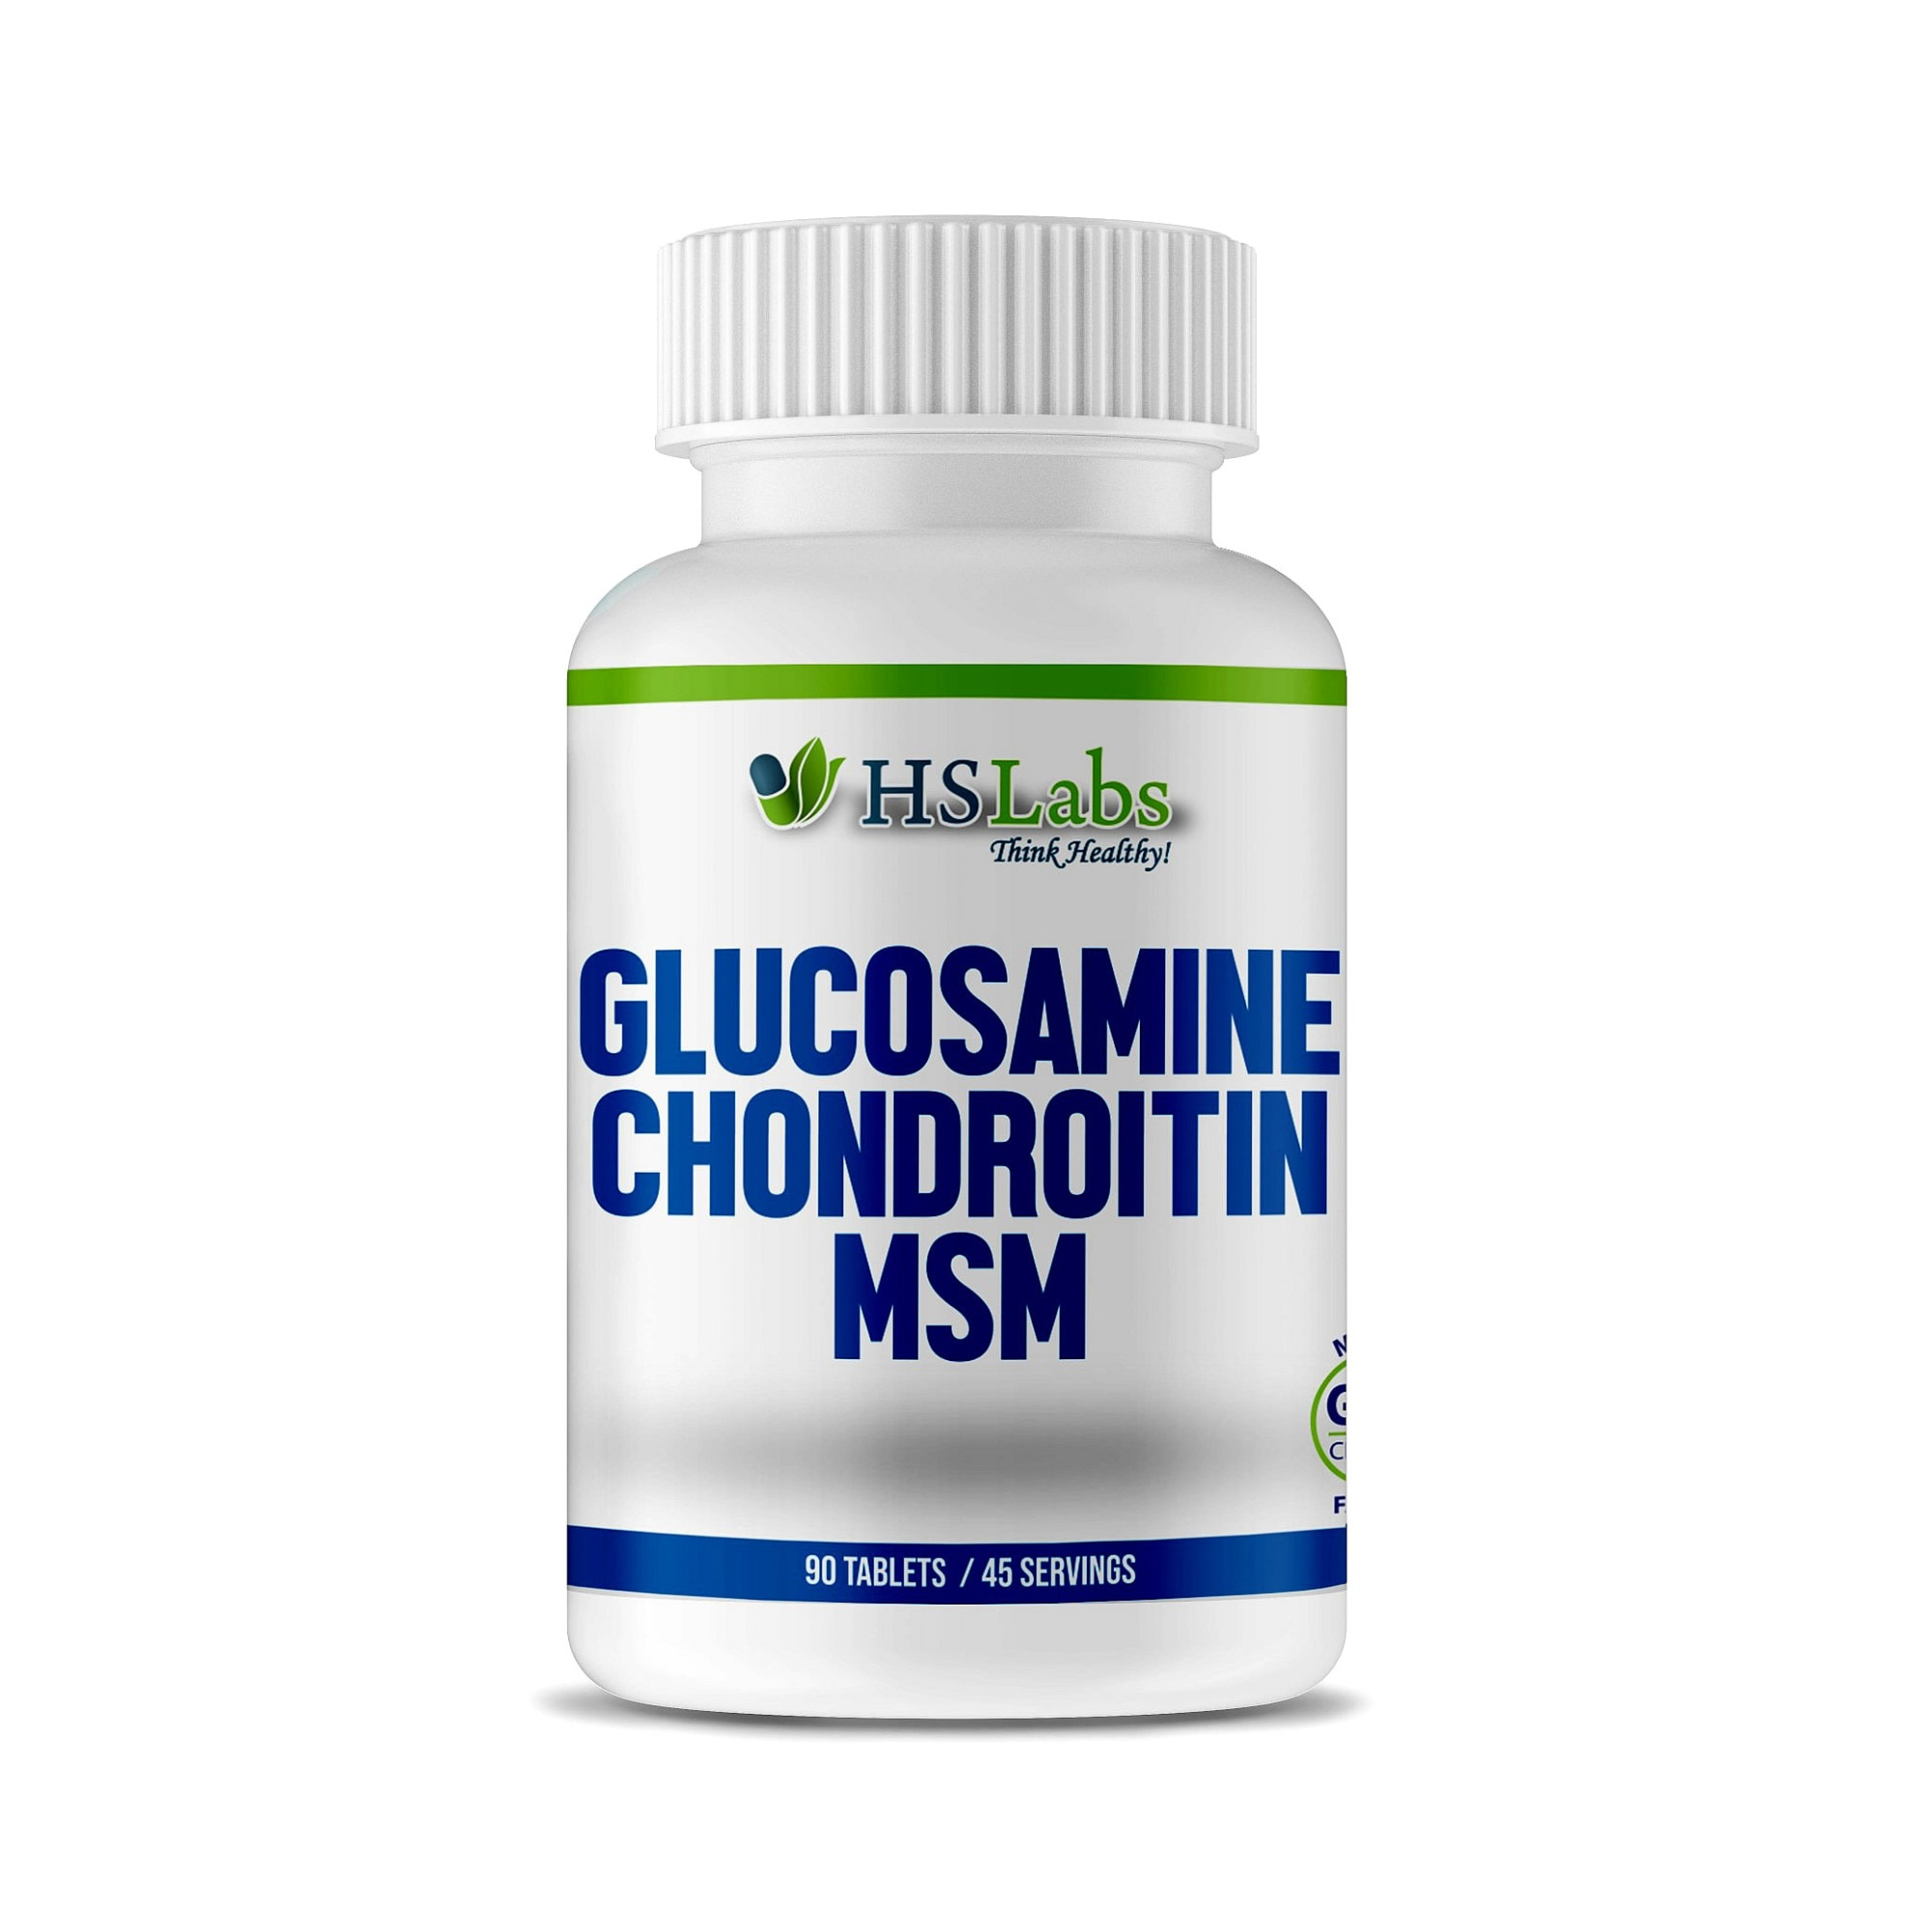 ce este mai bine condroitina sau glucozamina